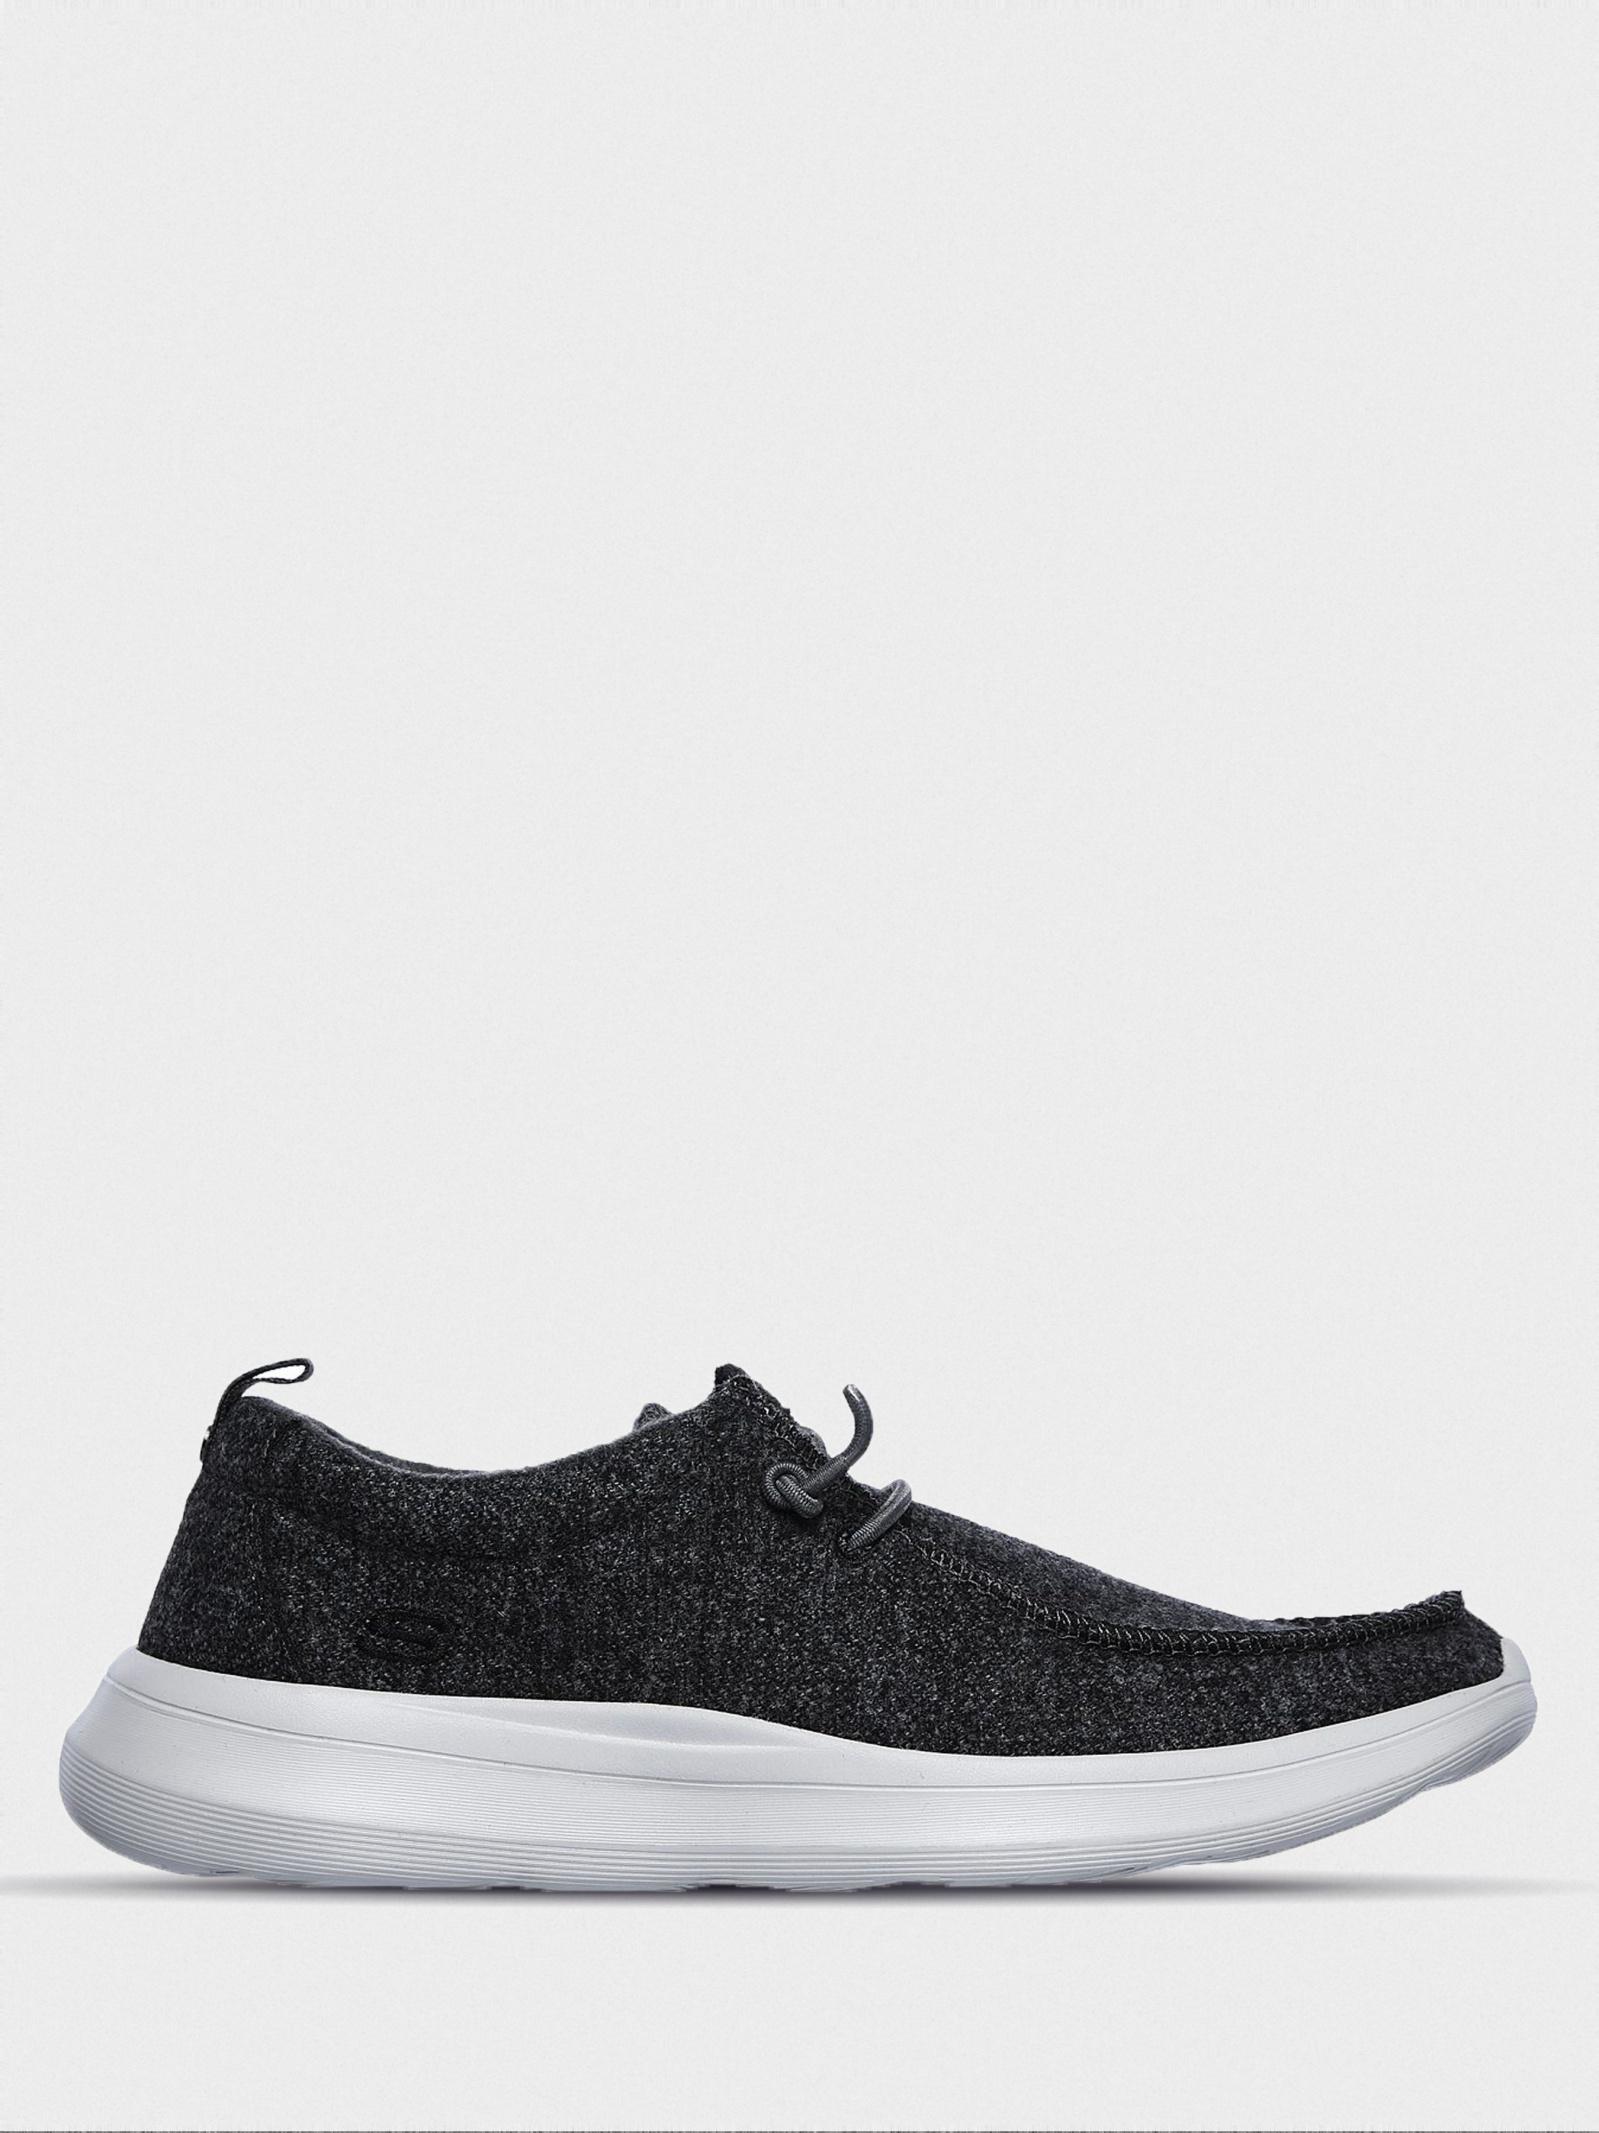 Полуботинки для мужчин Skechers KM3321 модная обувь, 2017